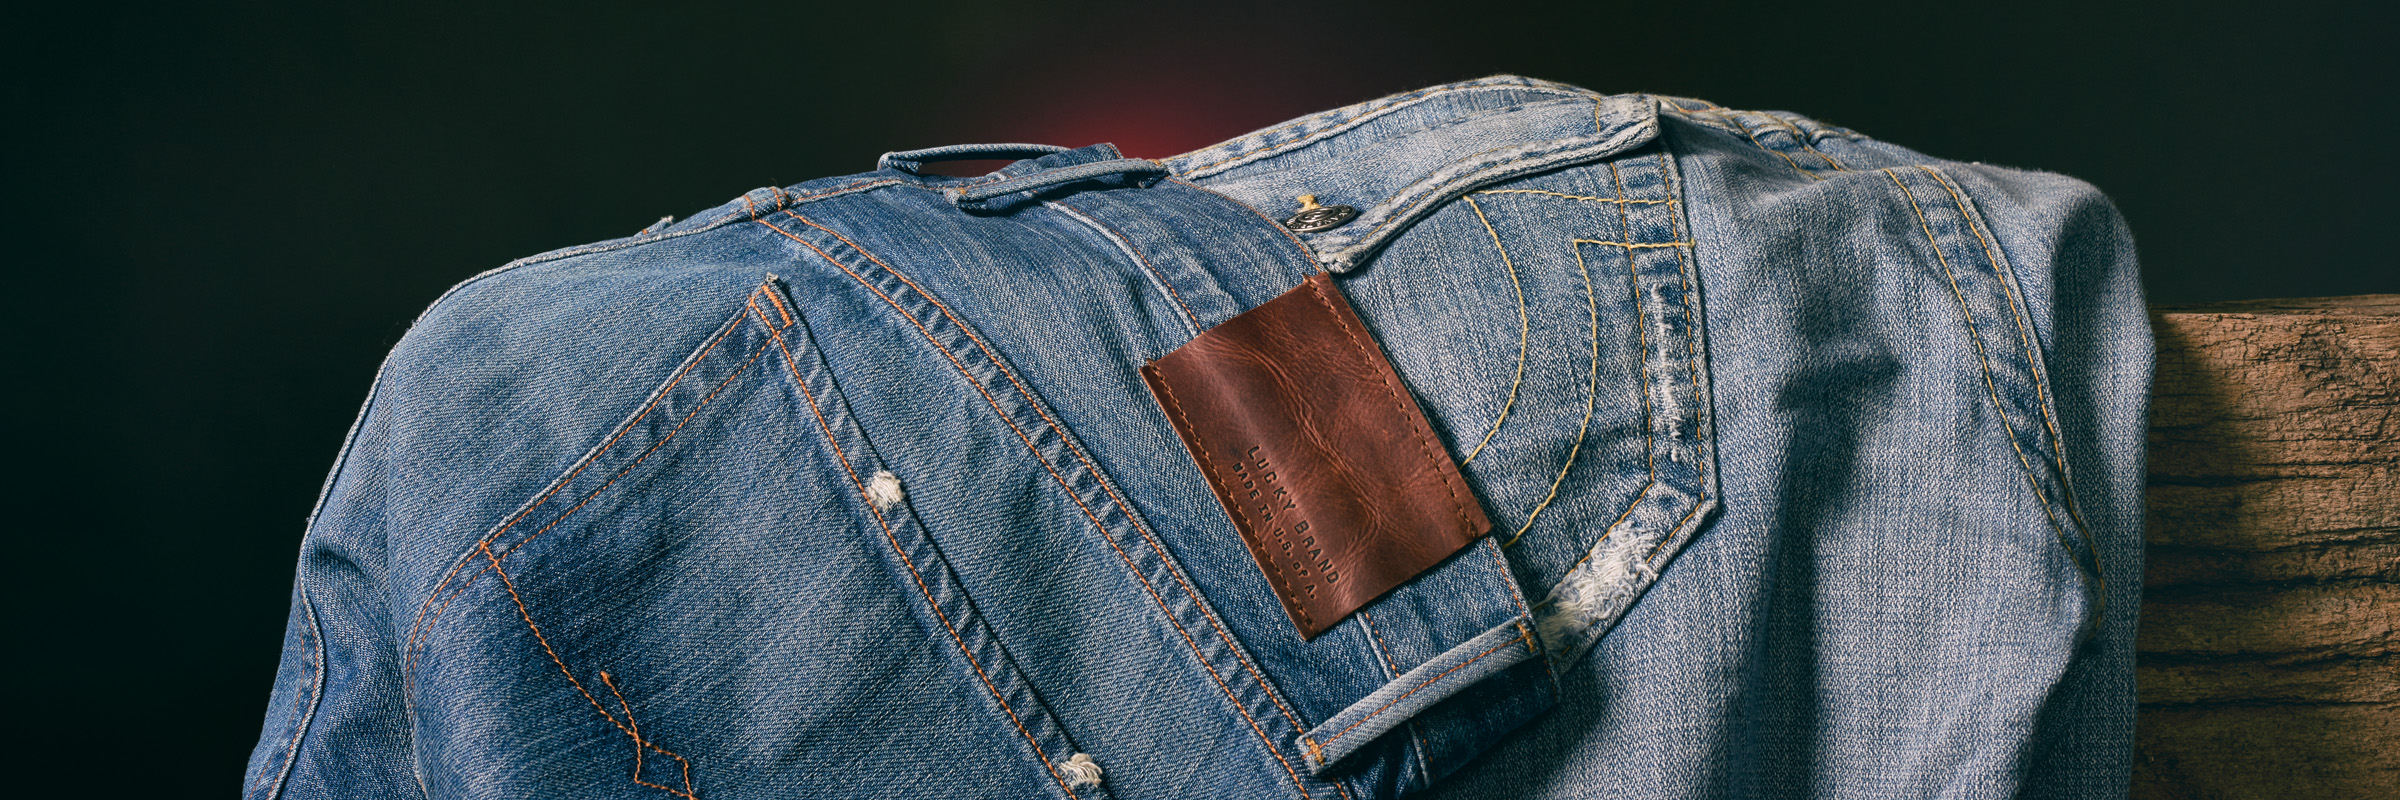 Jeans_001.jpg